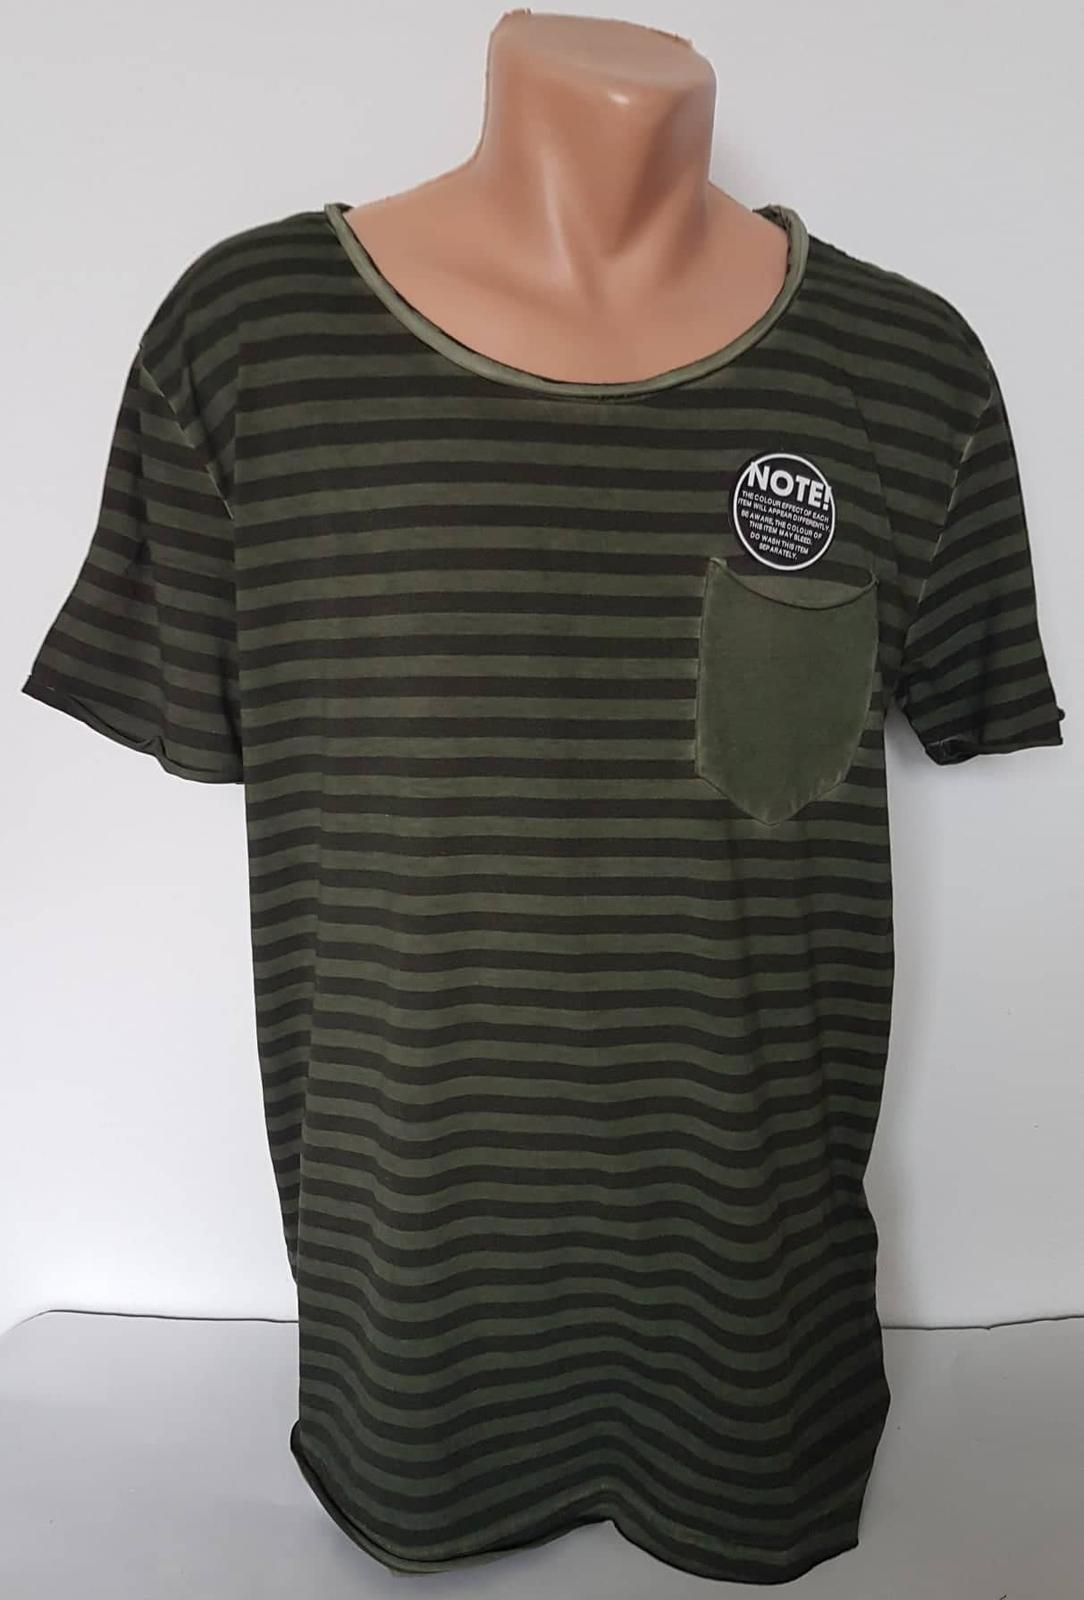 0f3ab860ab02 Pánske tričko tom tailor